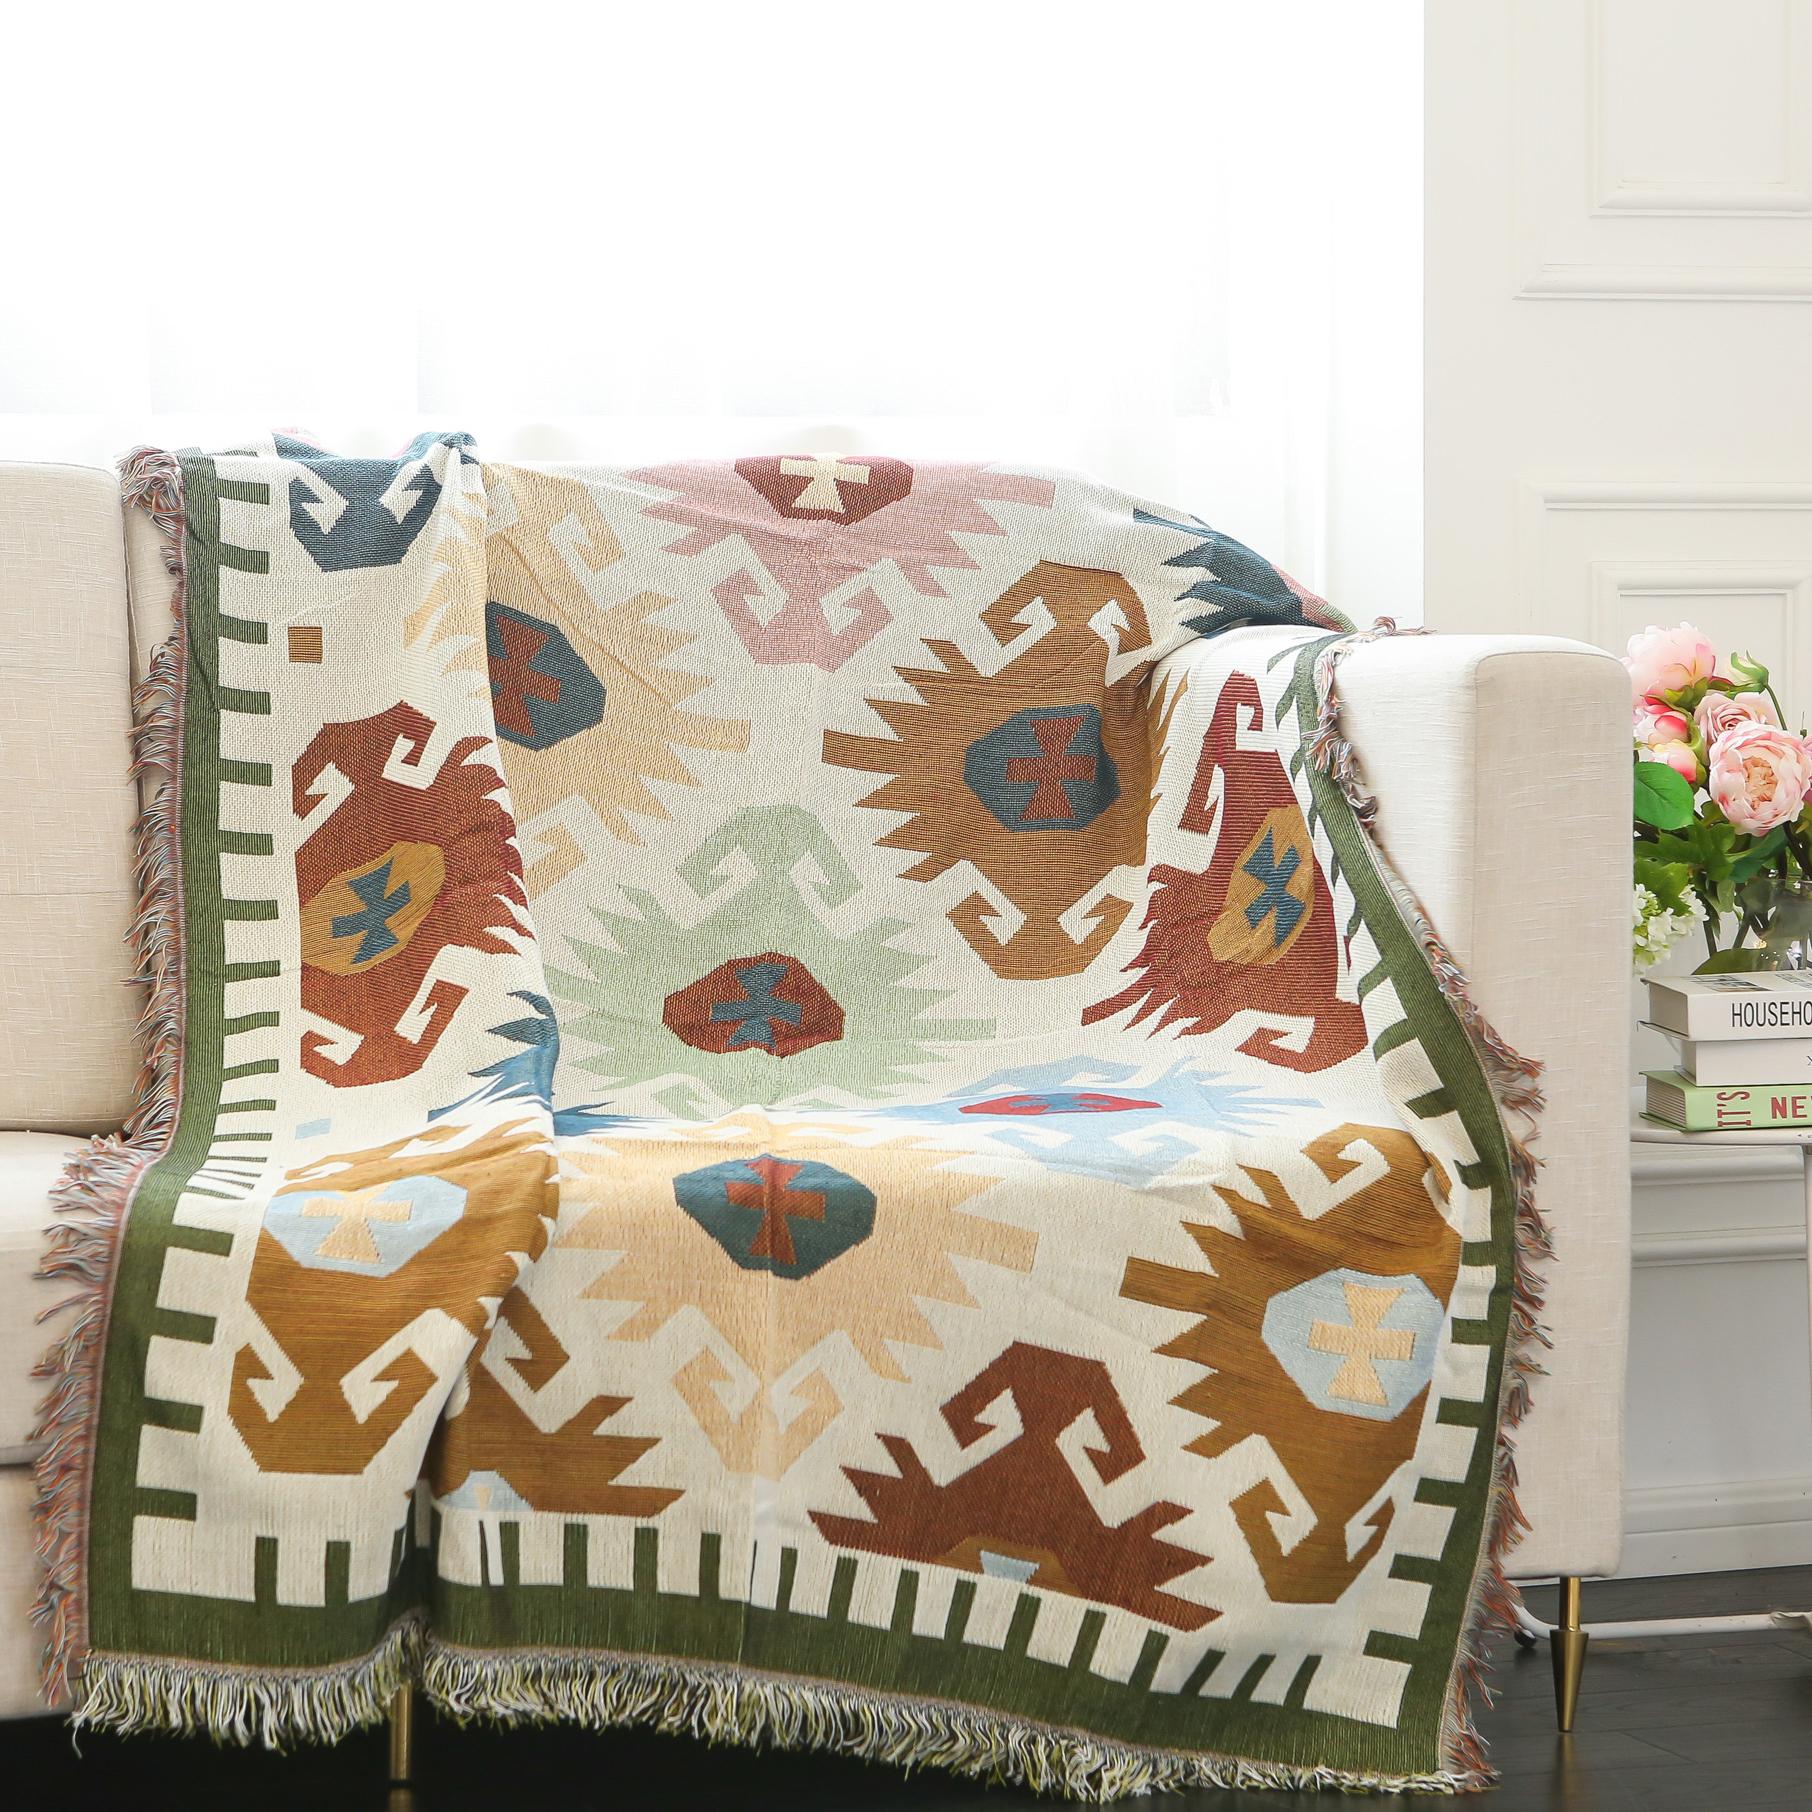 Factory Wholesale Cheap Jacquard Throw Blankets for Sofa  Throw Blanket Bohemian Rug Sofa Cover